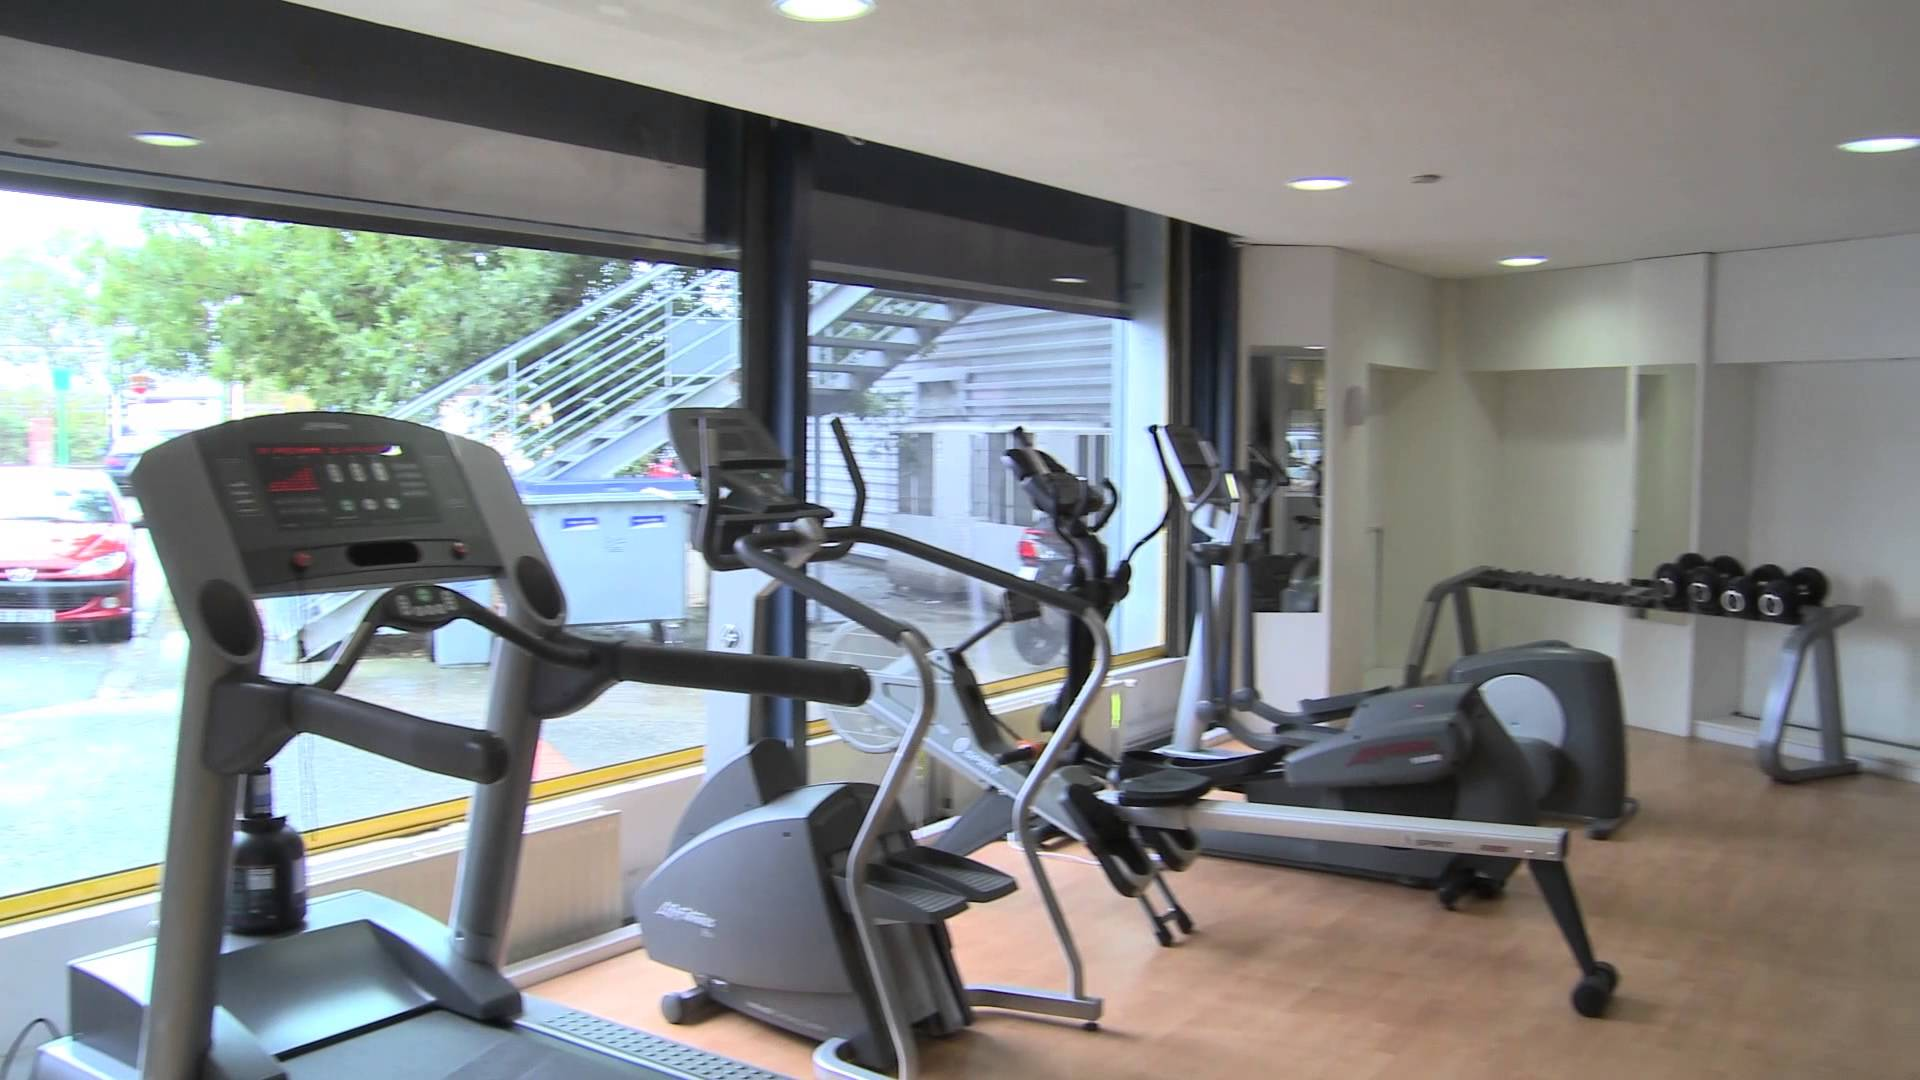 Appareil De Fitness Professionnel Muscu Maison